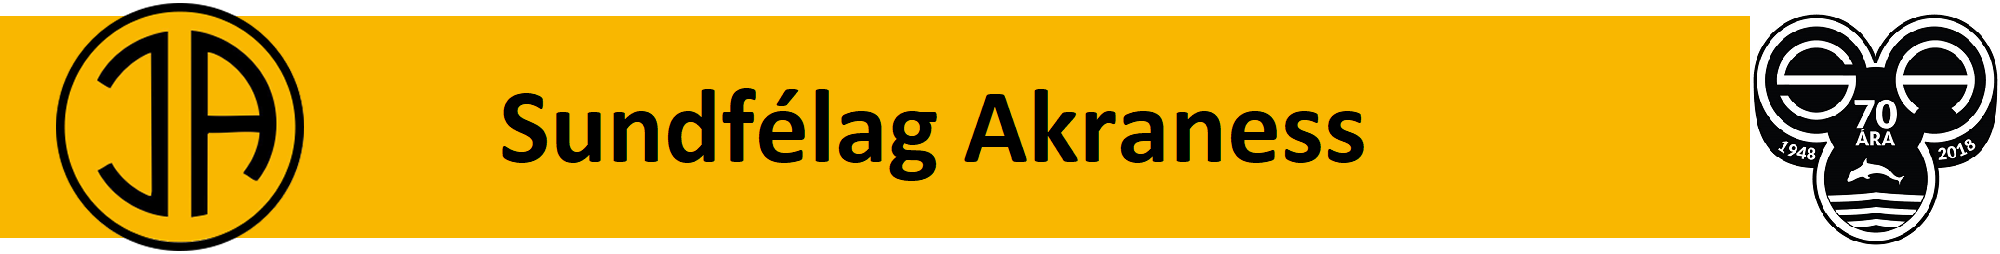 Sundfélag Akraness